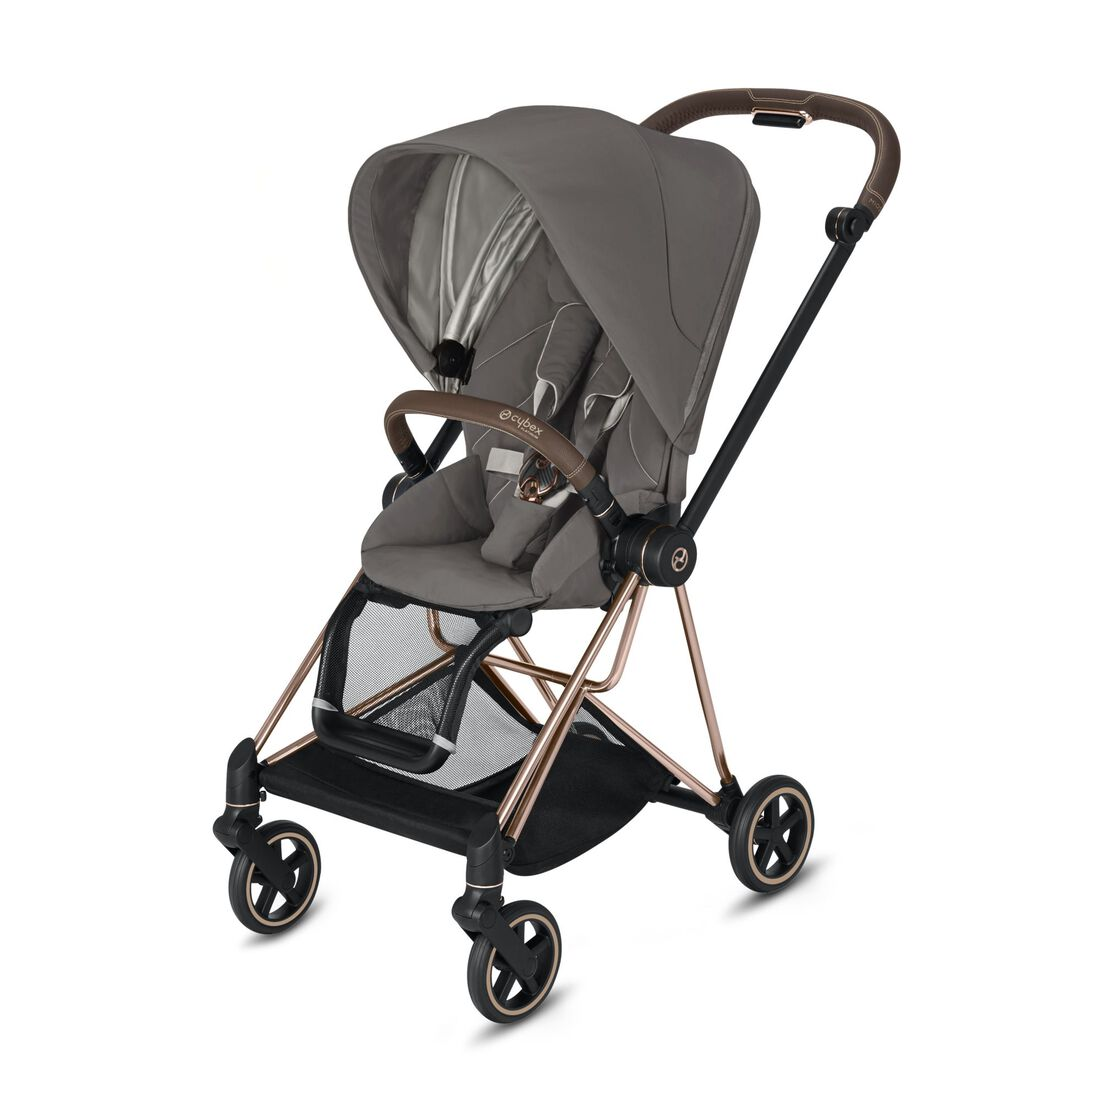 CYBEX Mios Seat Pack - Soho Grey in Soho Grey large image number 2